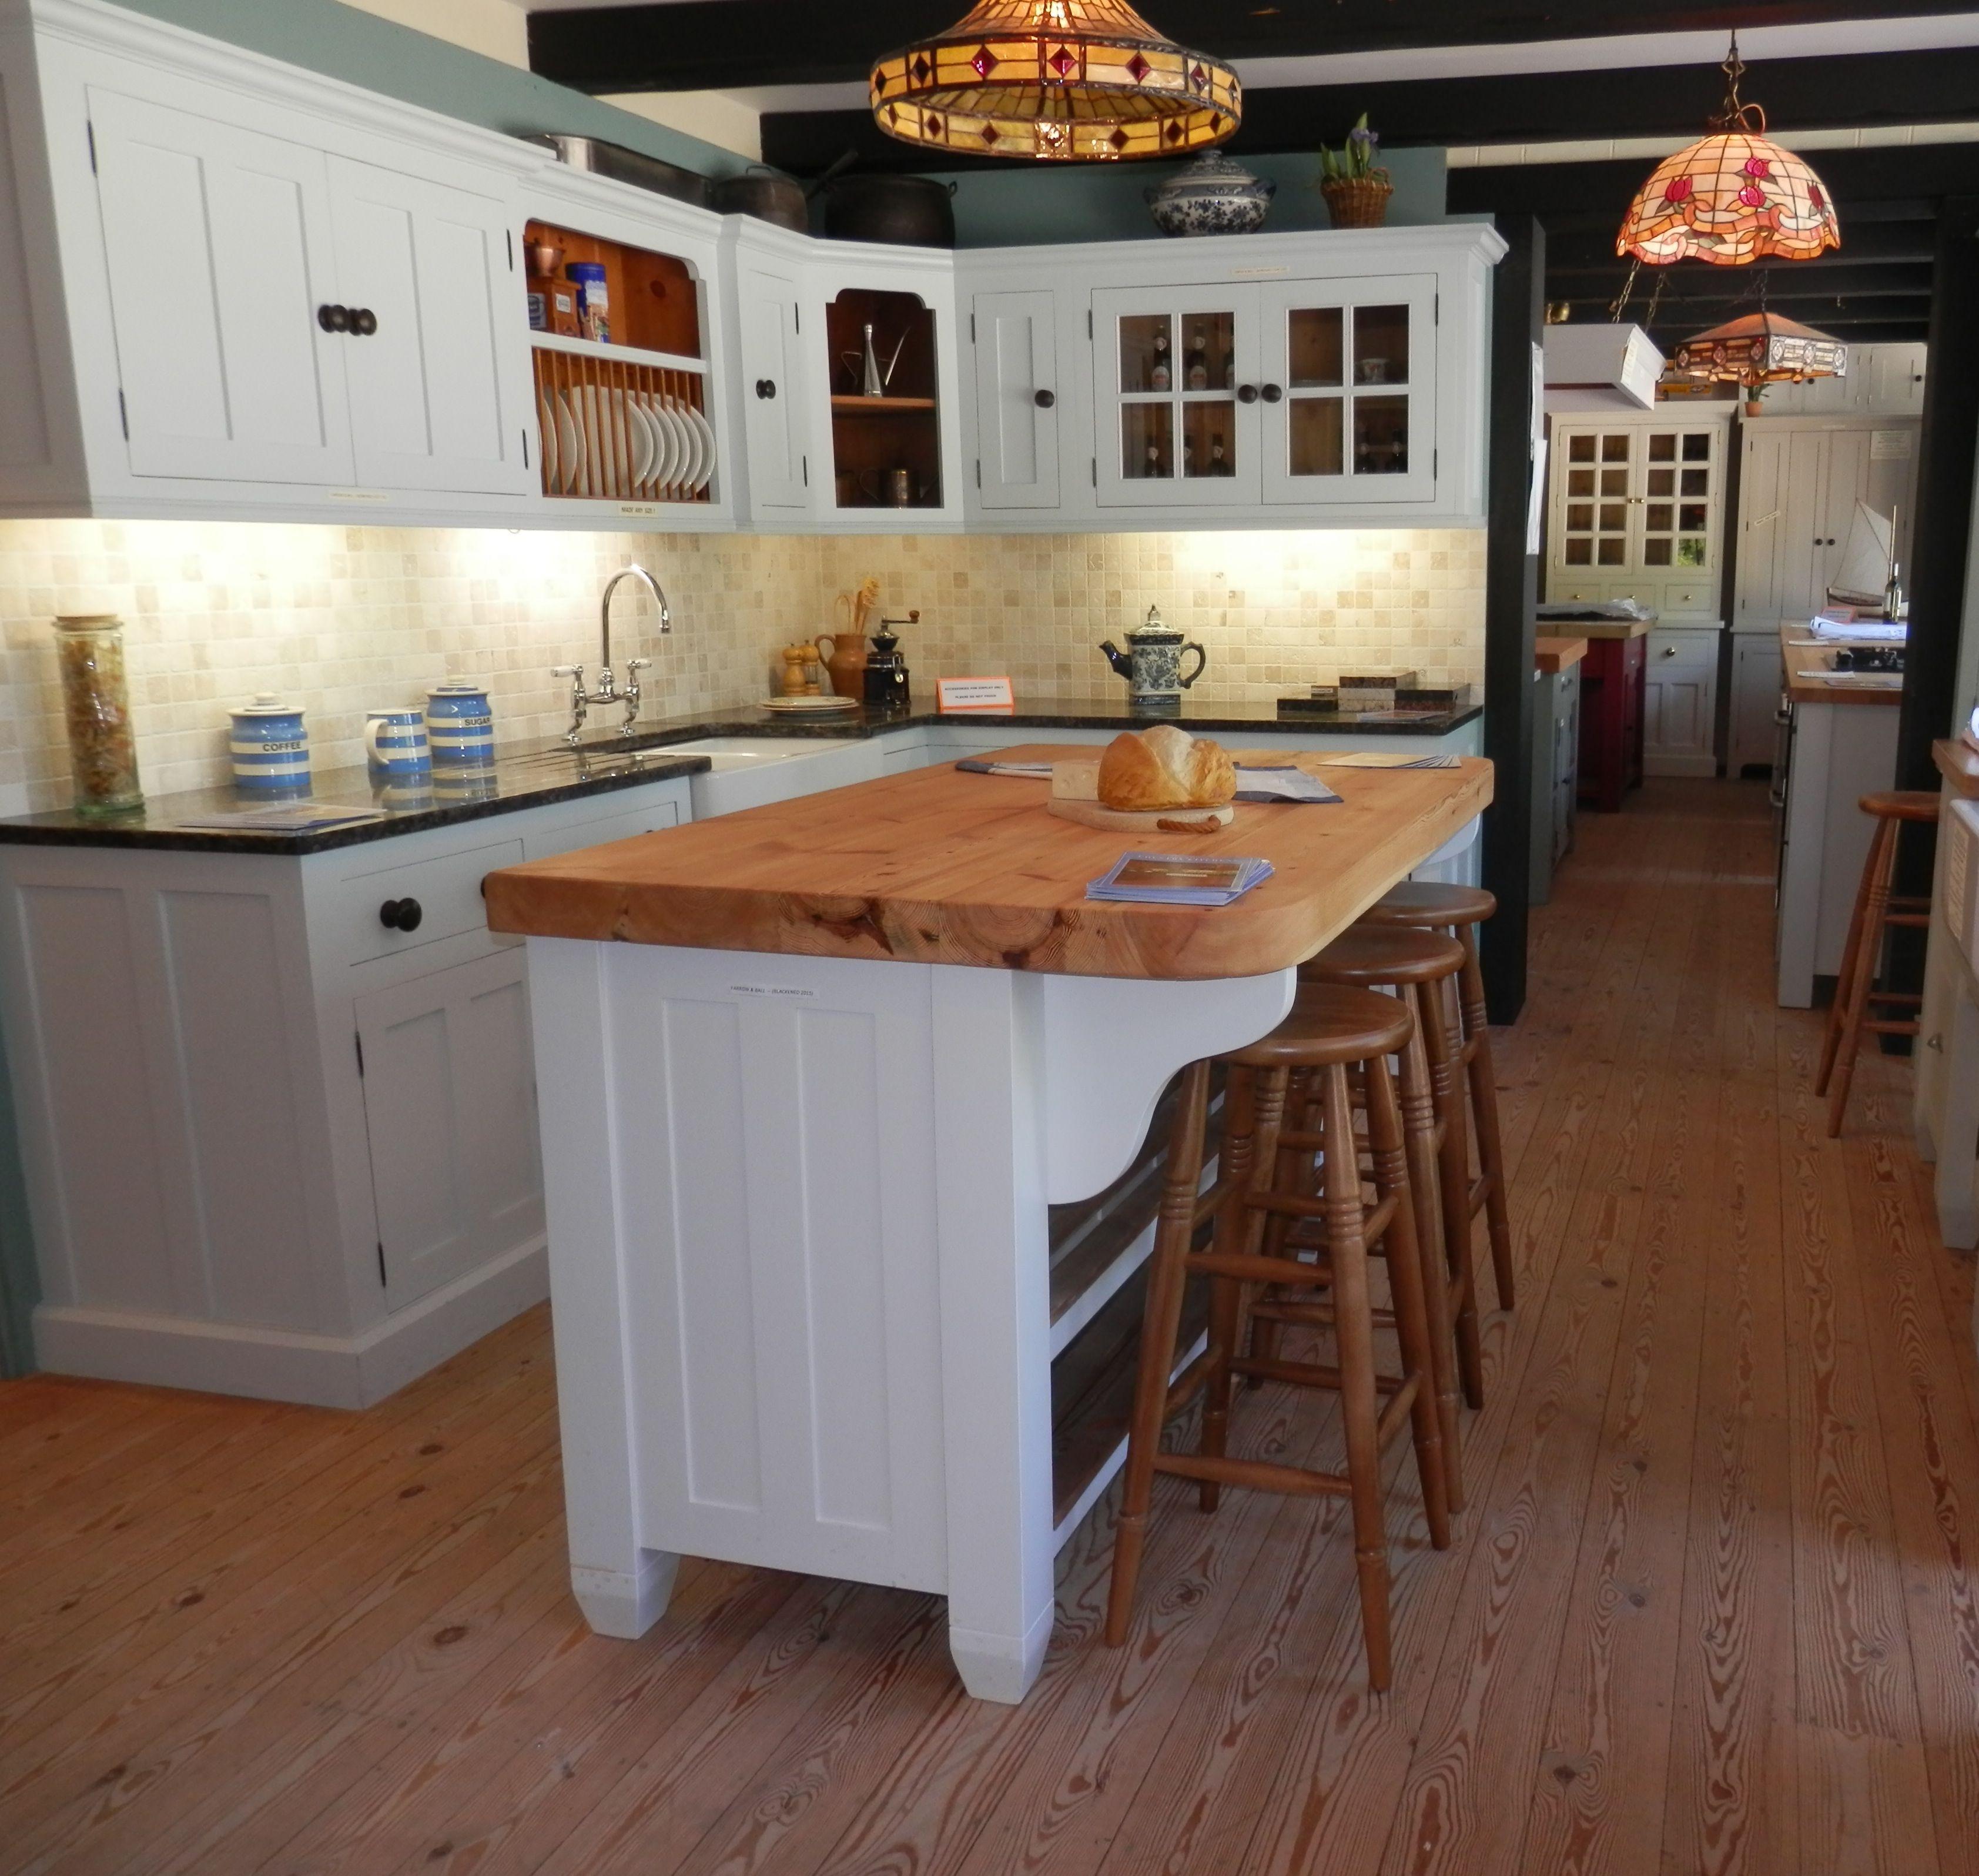 Shabby Chic Kitchen Island: Pin By Jen Brevitz On My OH My New Kitchen